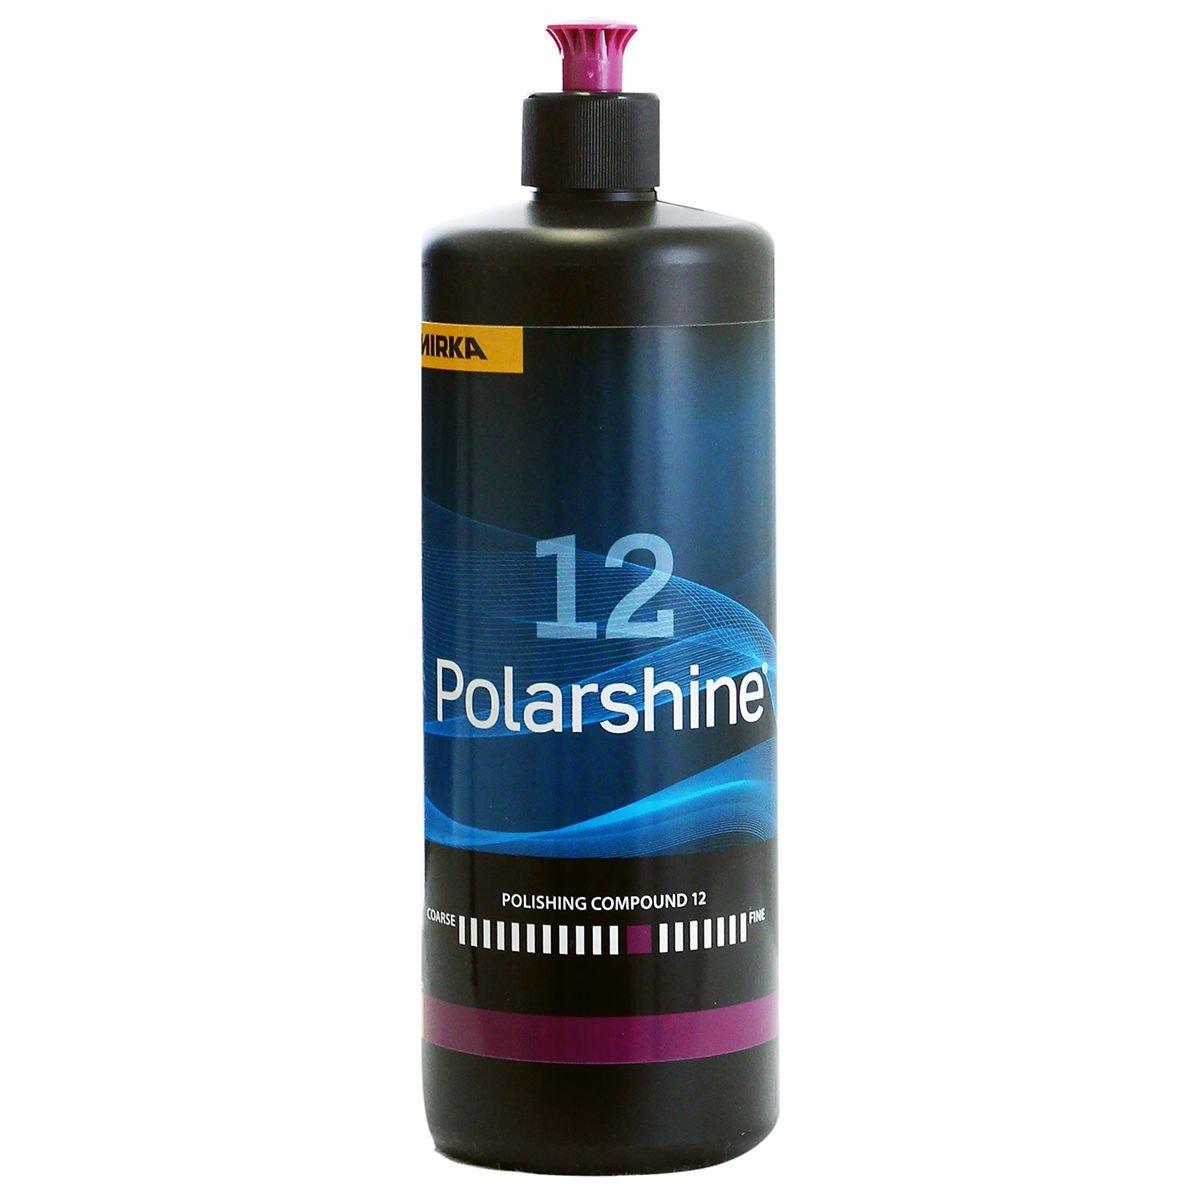 Mirka Polarshine 12